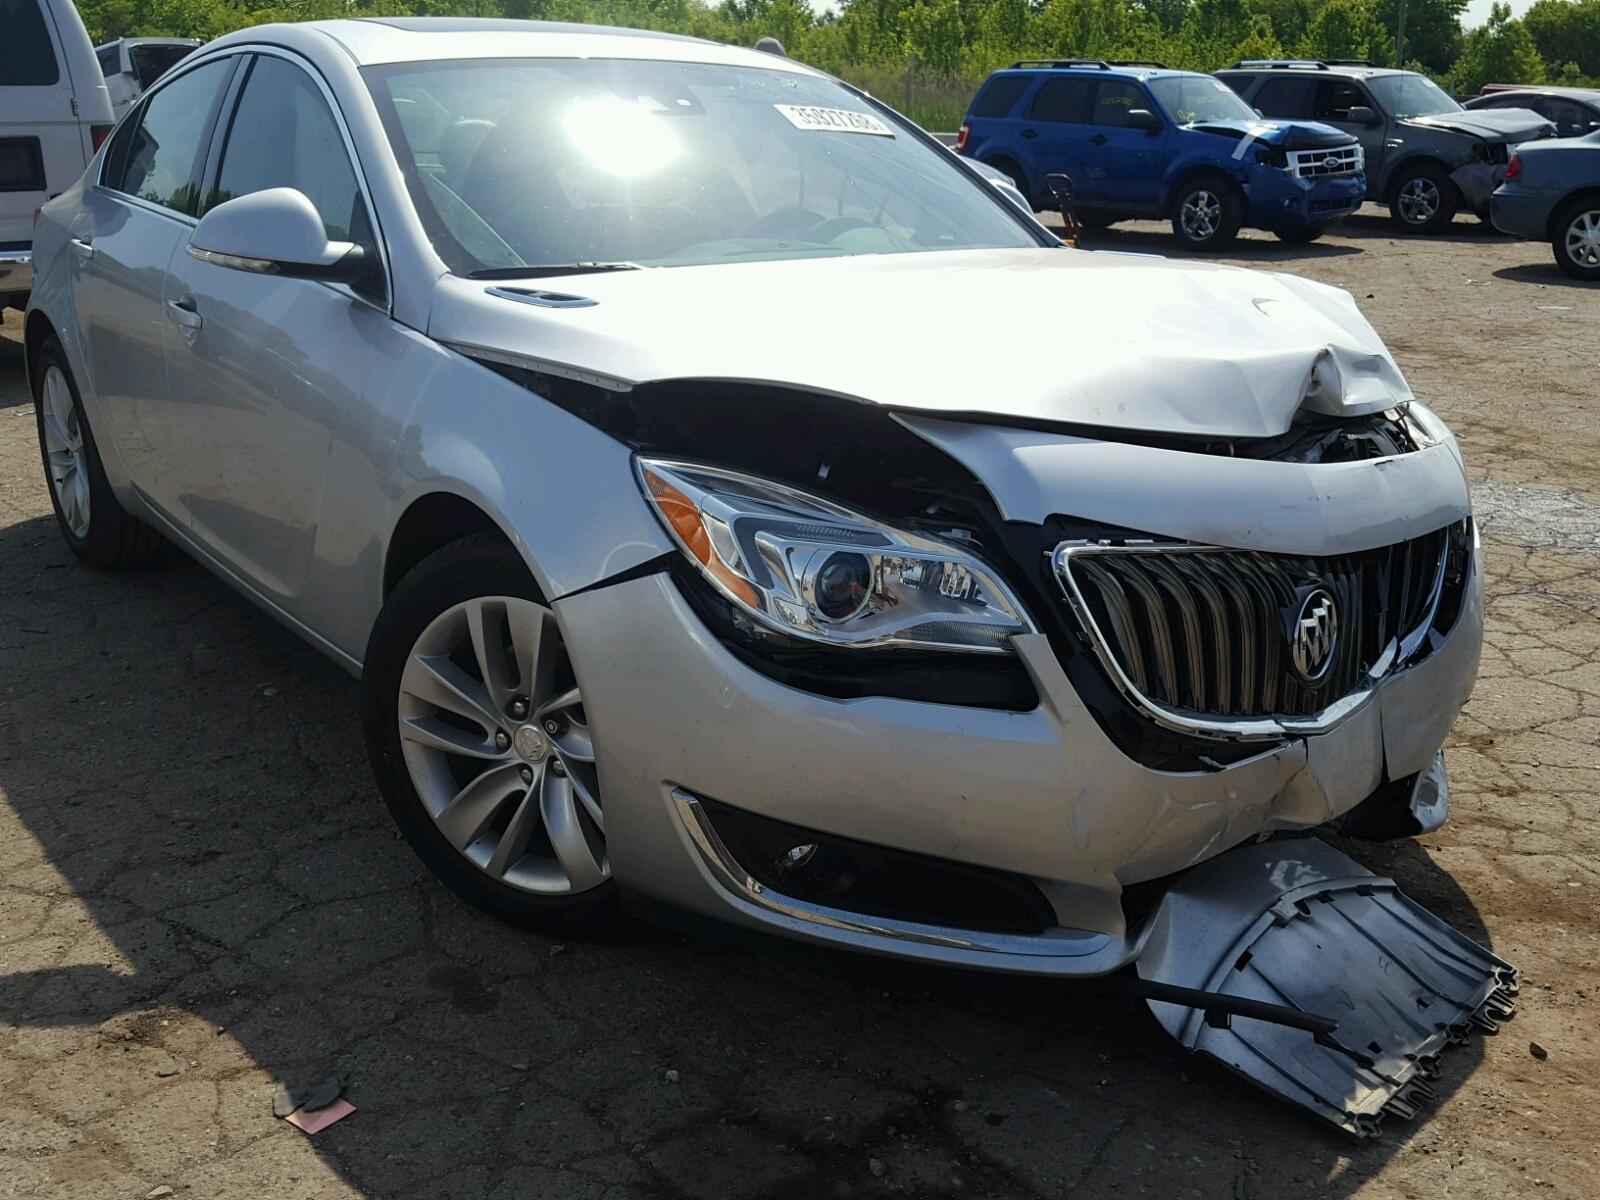 Buick Regal: Vehicle Identification Number (VIN)